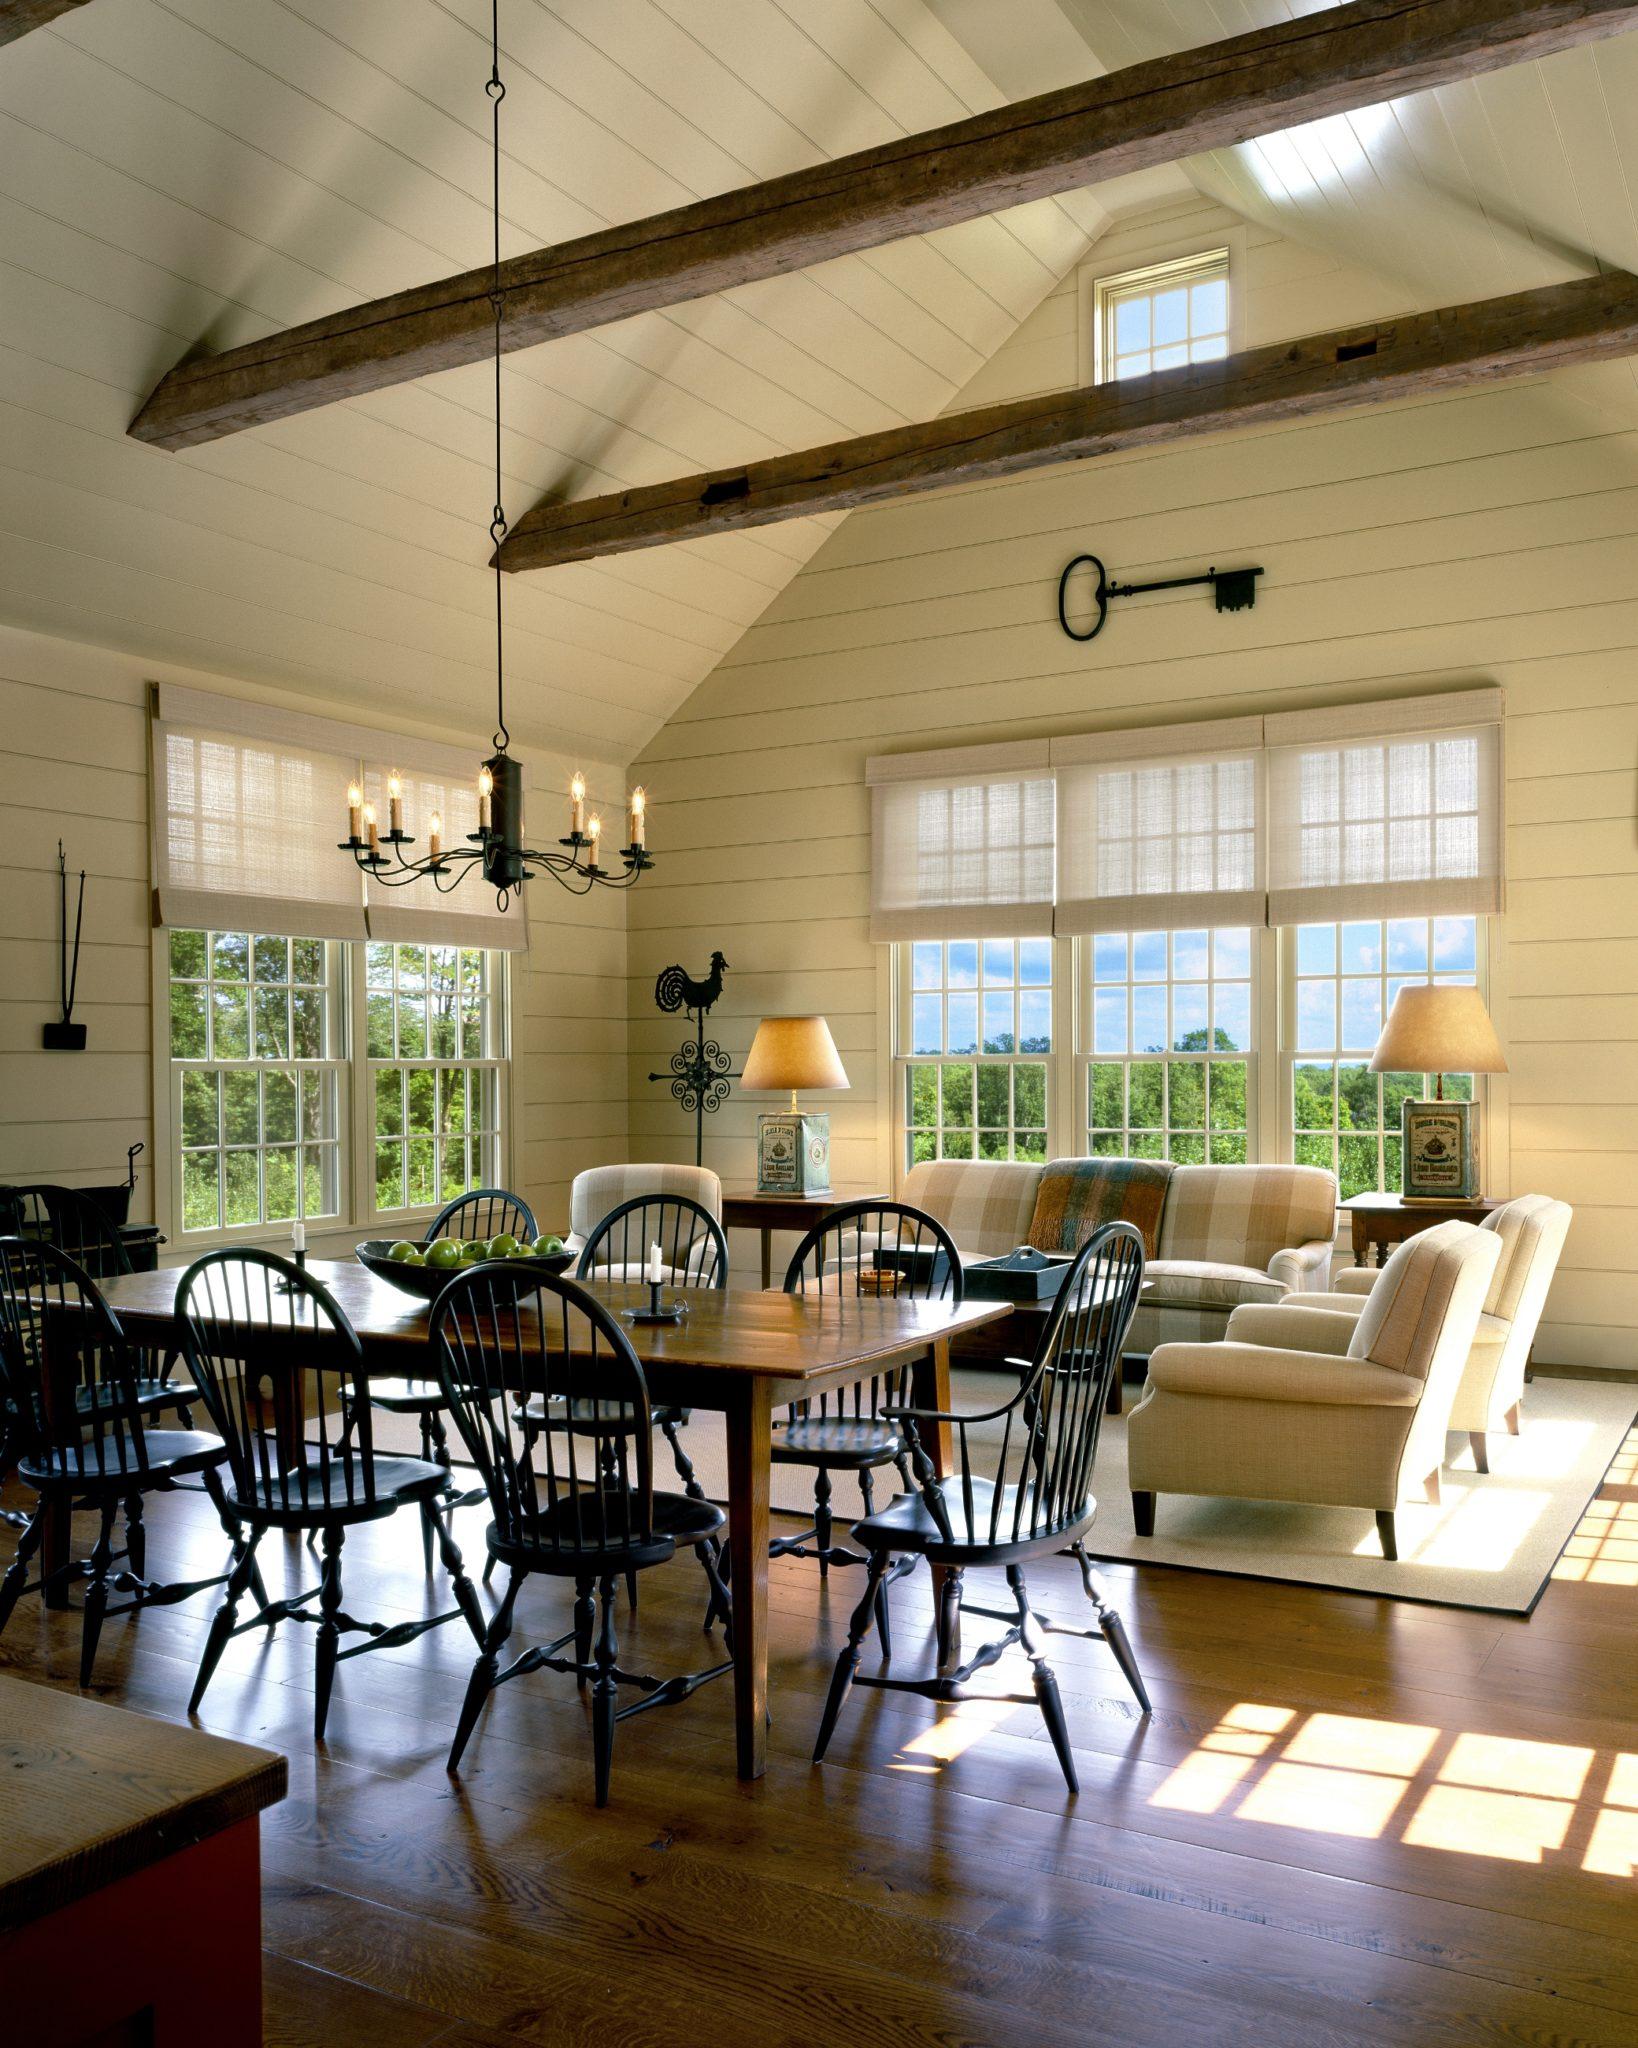 Sun Room, Hilltop Barn House by Haver & Skolnick Architects